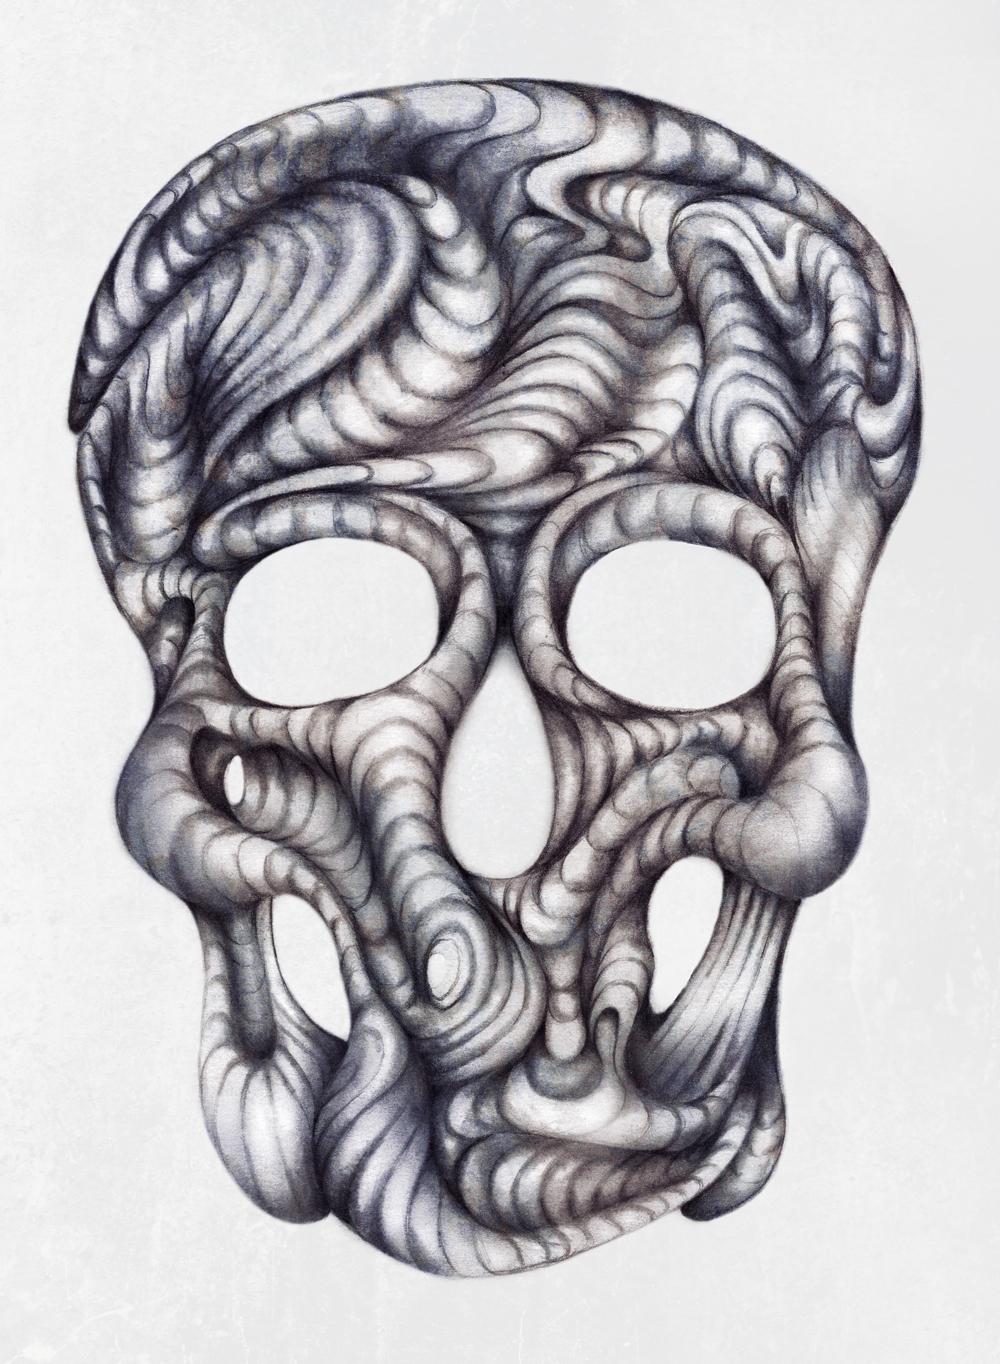 Adrianna-Grezak-skull-drawing